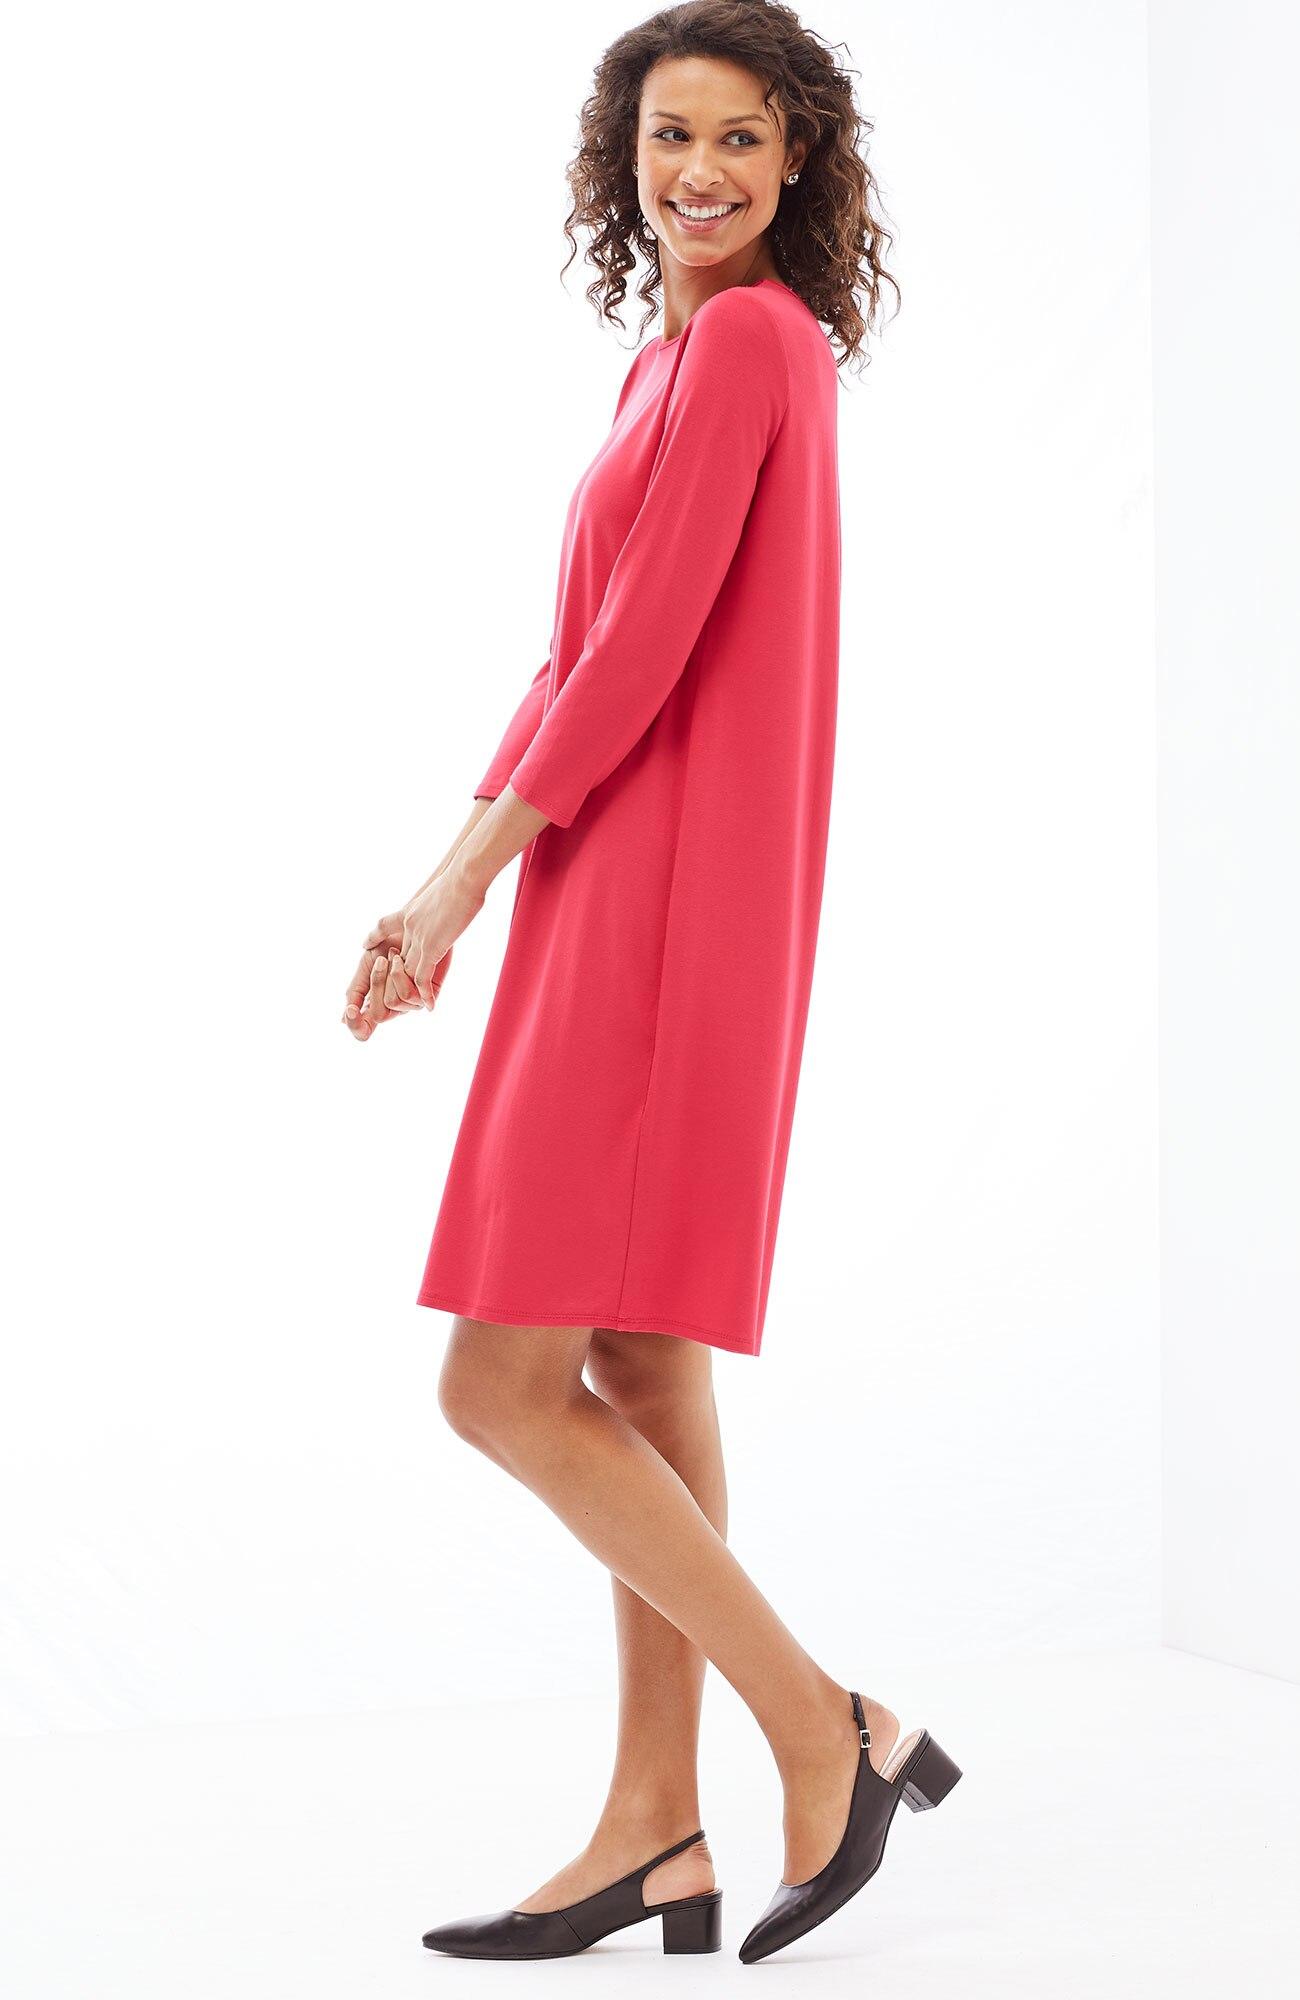 Wearever 3/4-sleeve pleated-back A-line dress